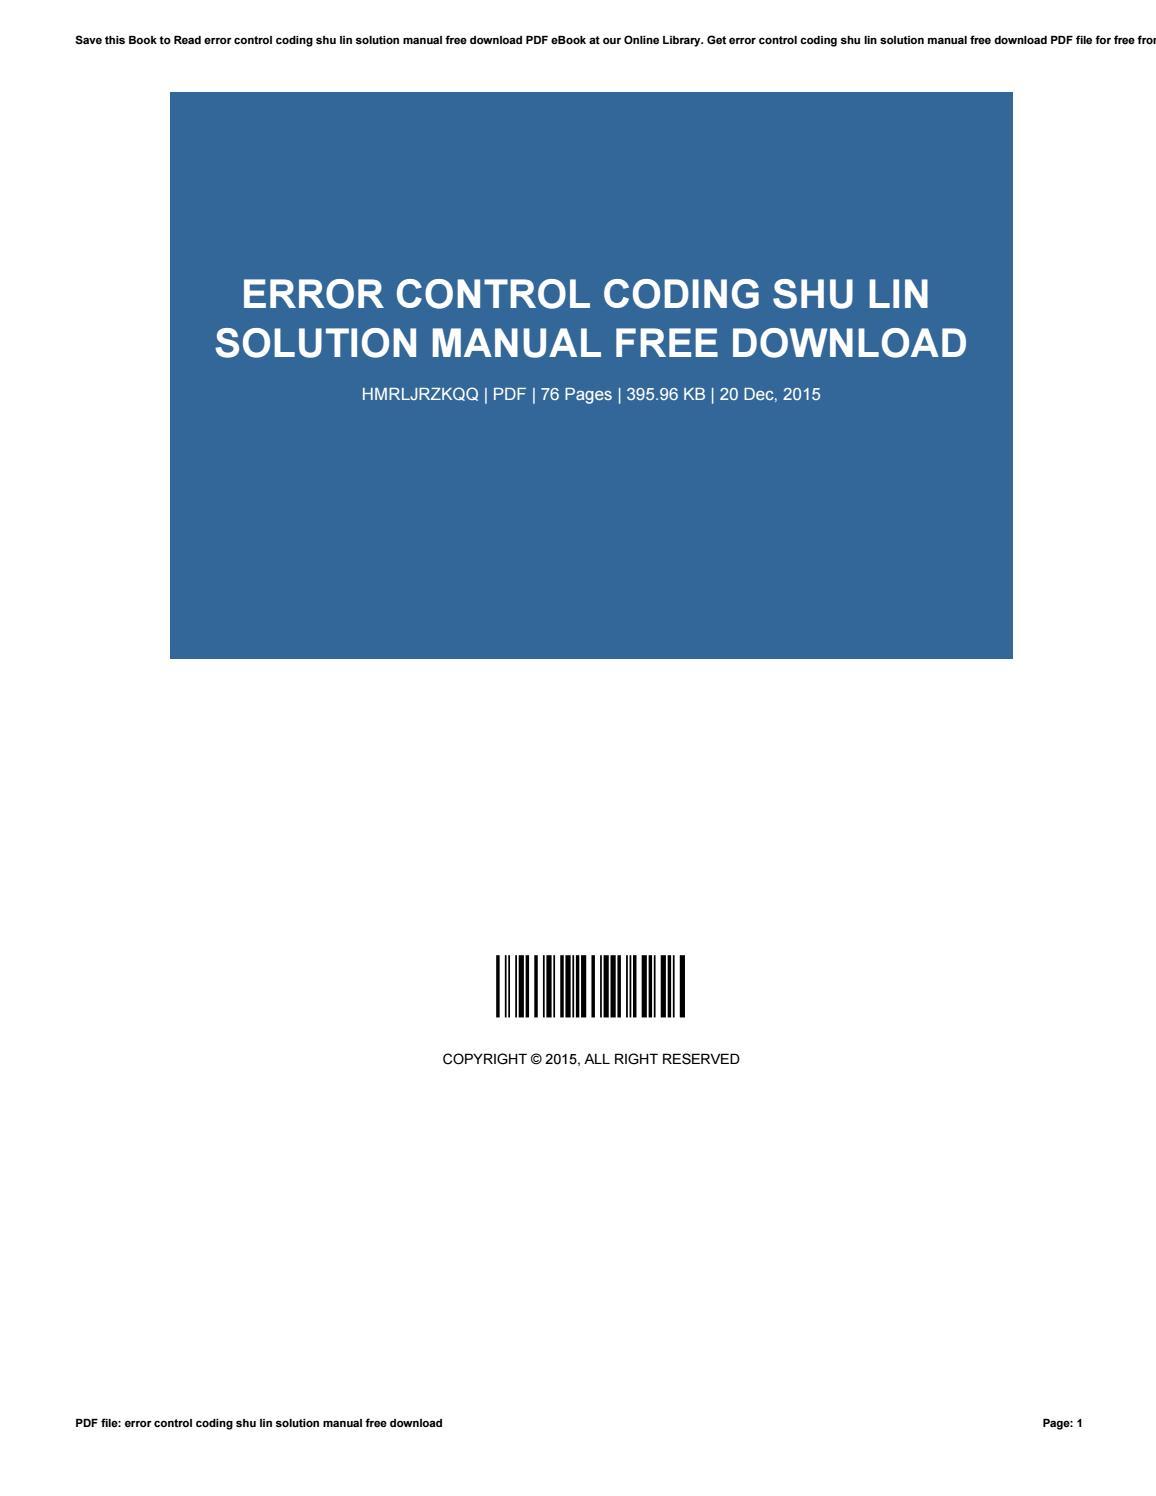 error control coding shu lin solution manual free download